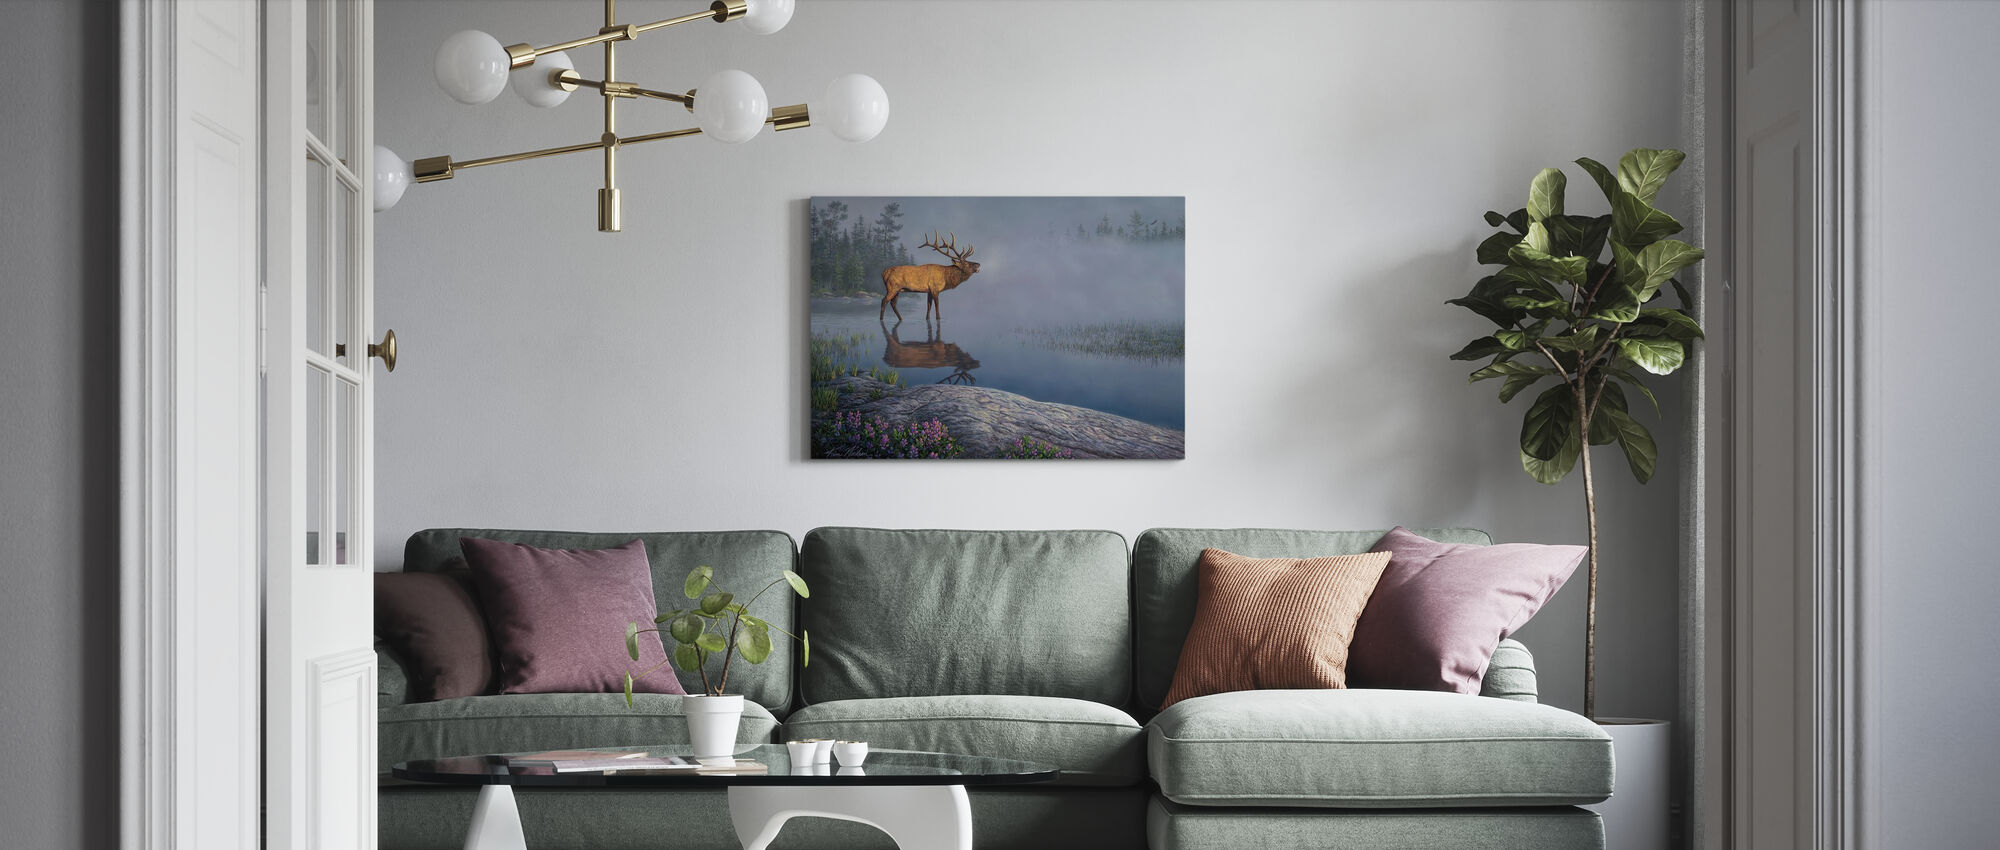 Bugle Boy - Canvas print - Living Room